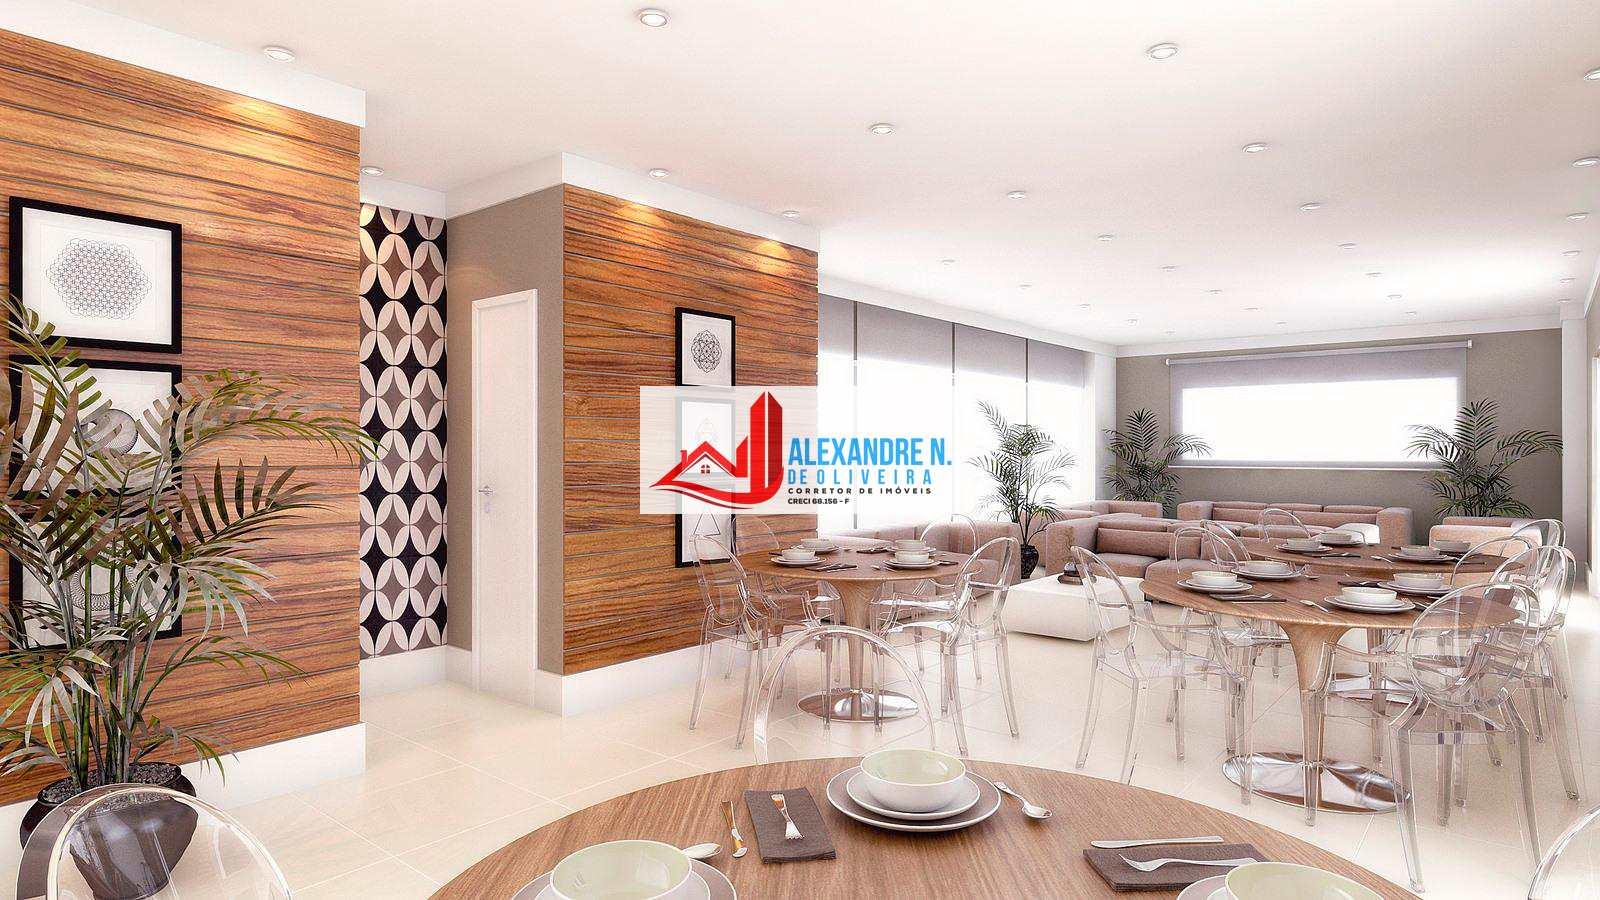 Apto 3 dorms, Ocian, Praia Grande, Entr. R$ 53 mil, AP00593